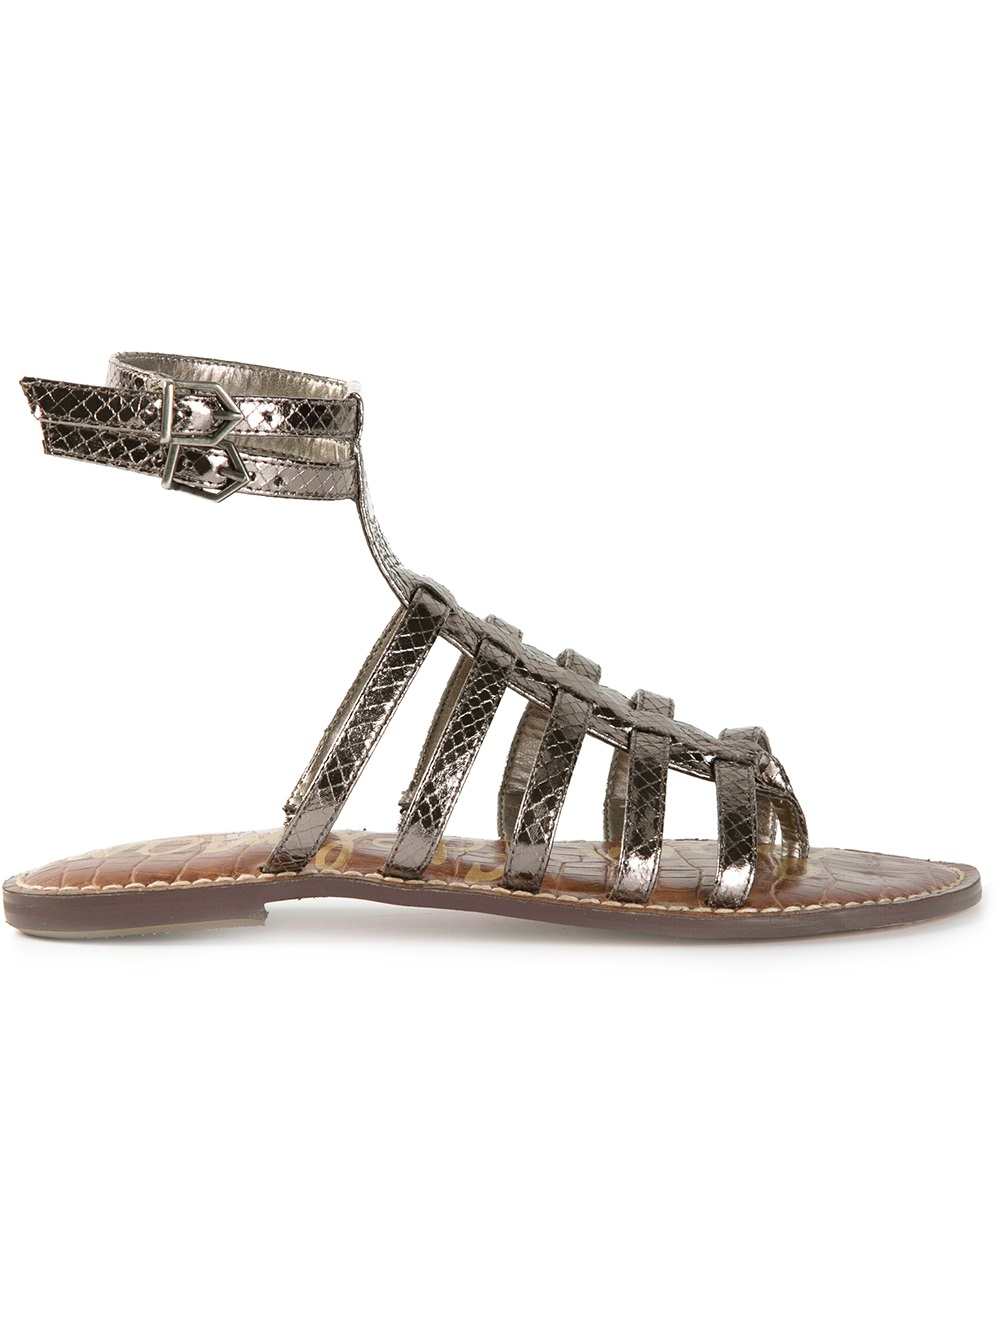 Sam Edelman Gilda Gladiator Sandals In Metallic Lyst